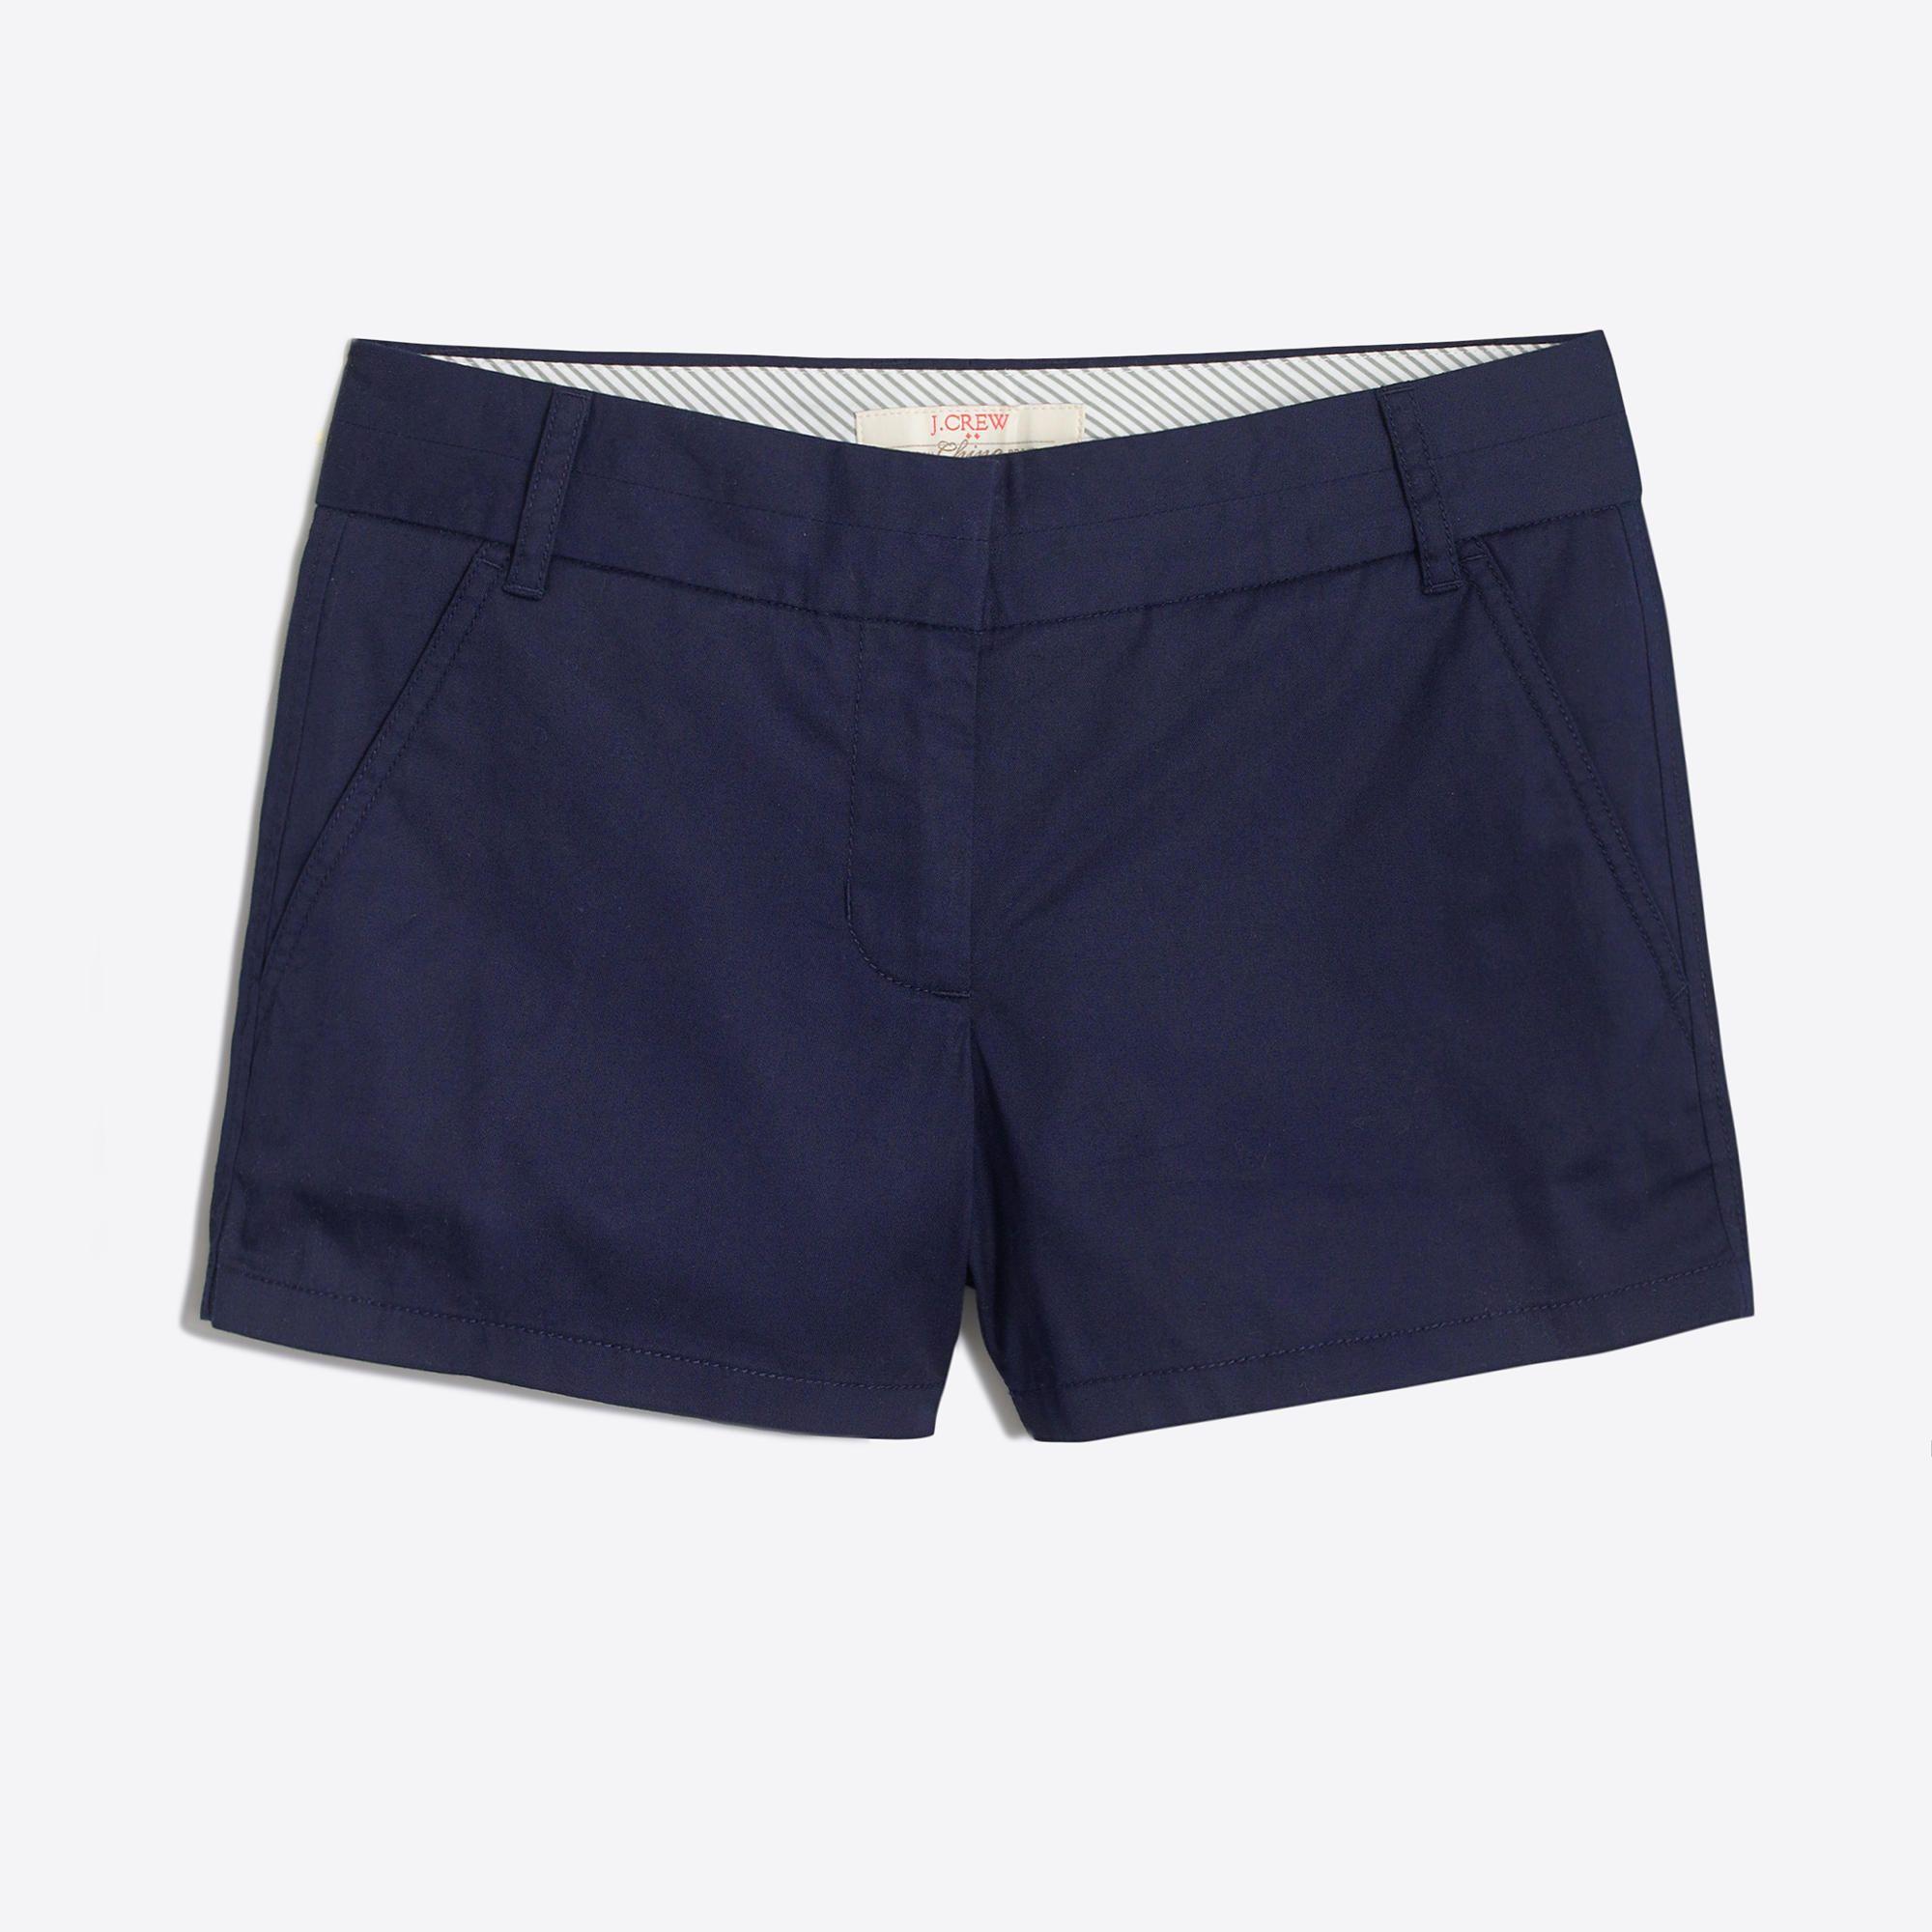 black chino shorts womens